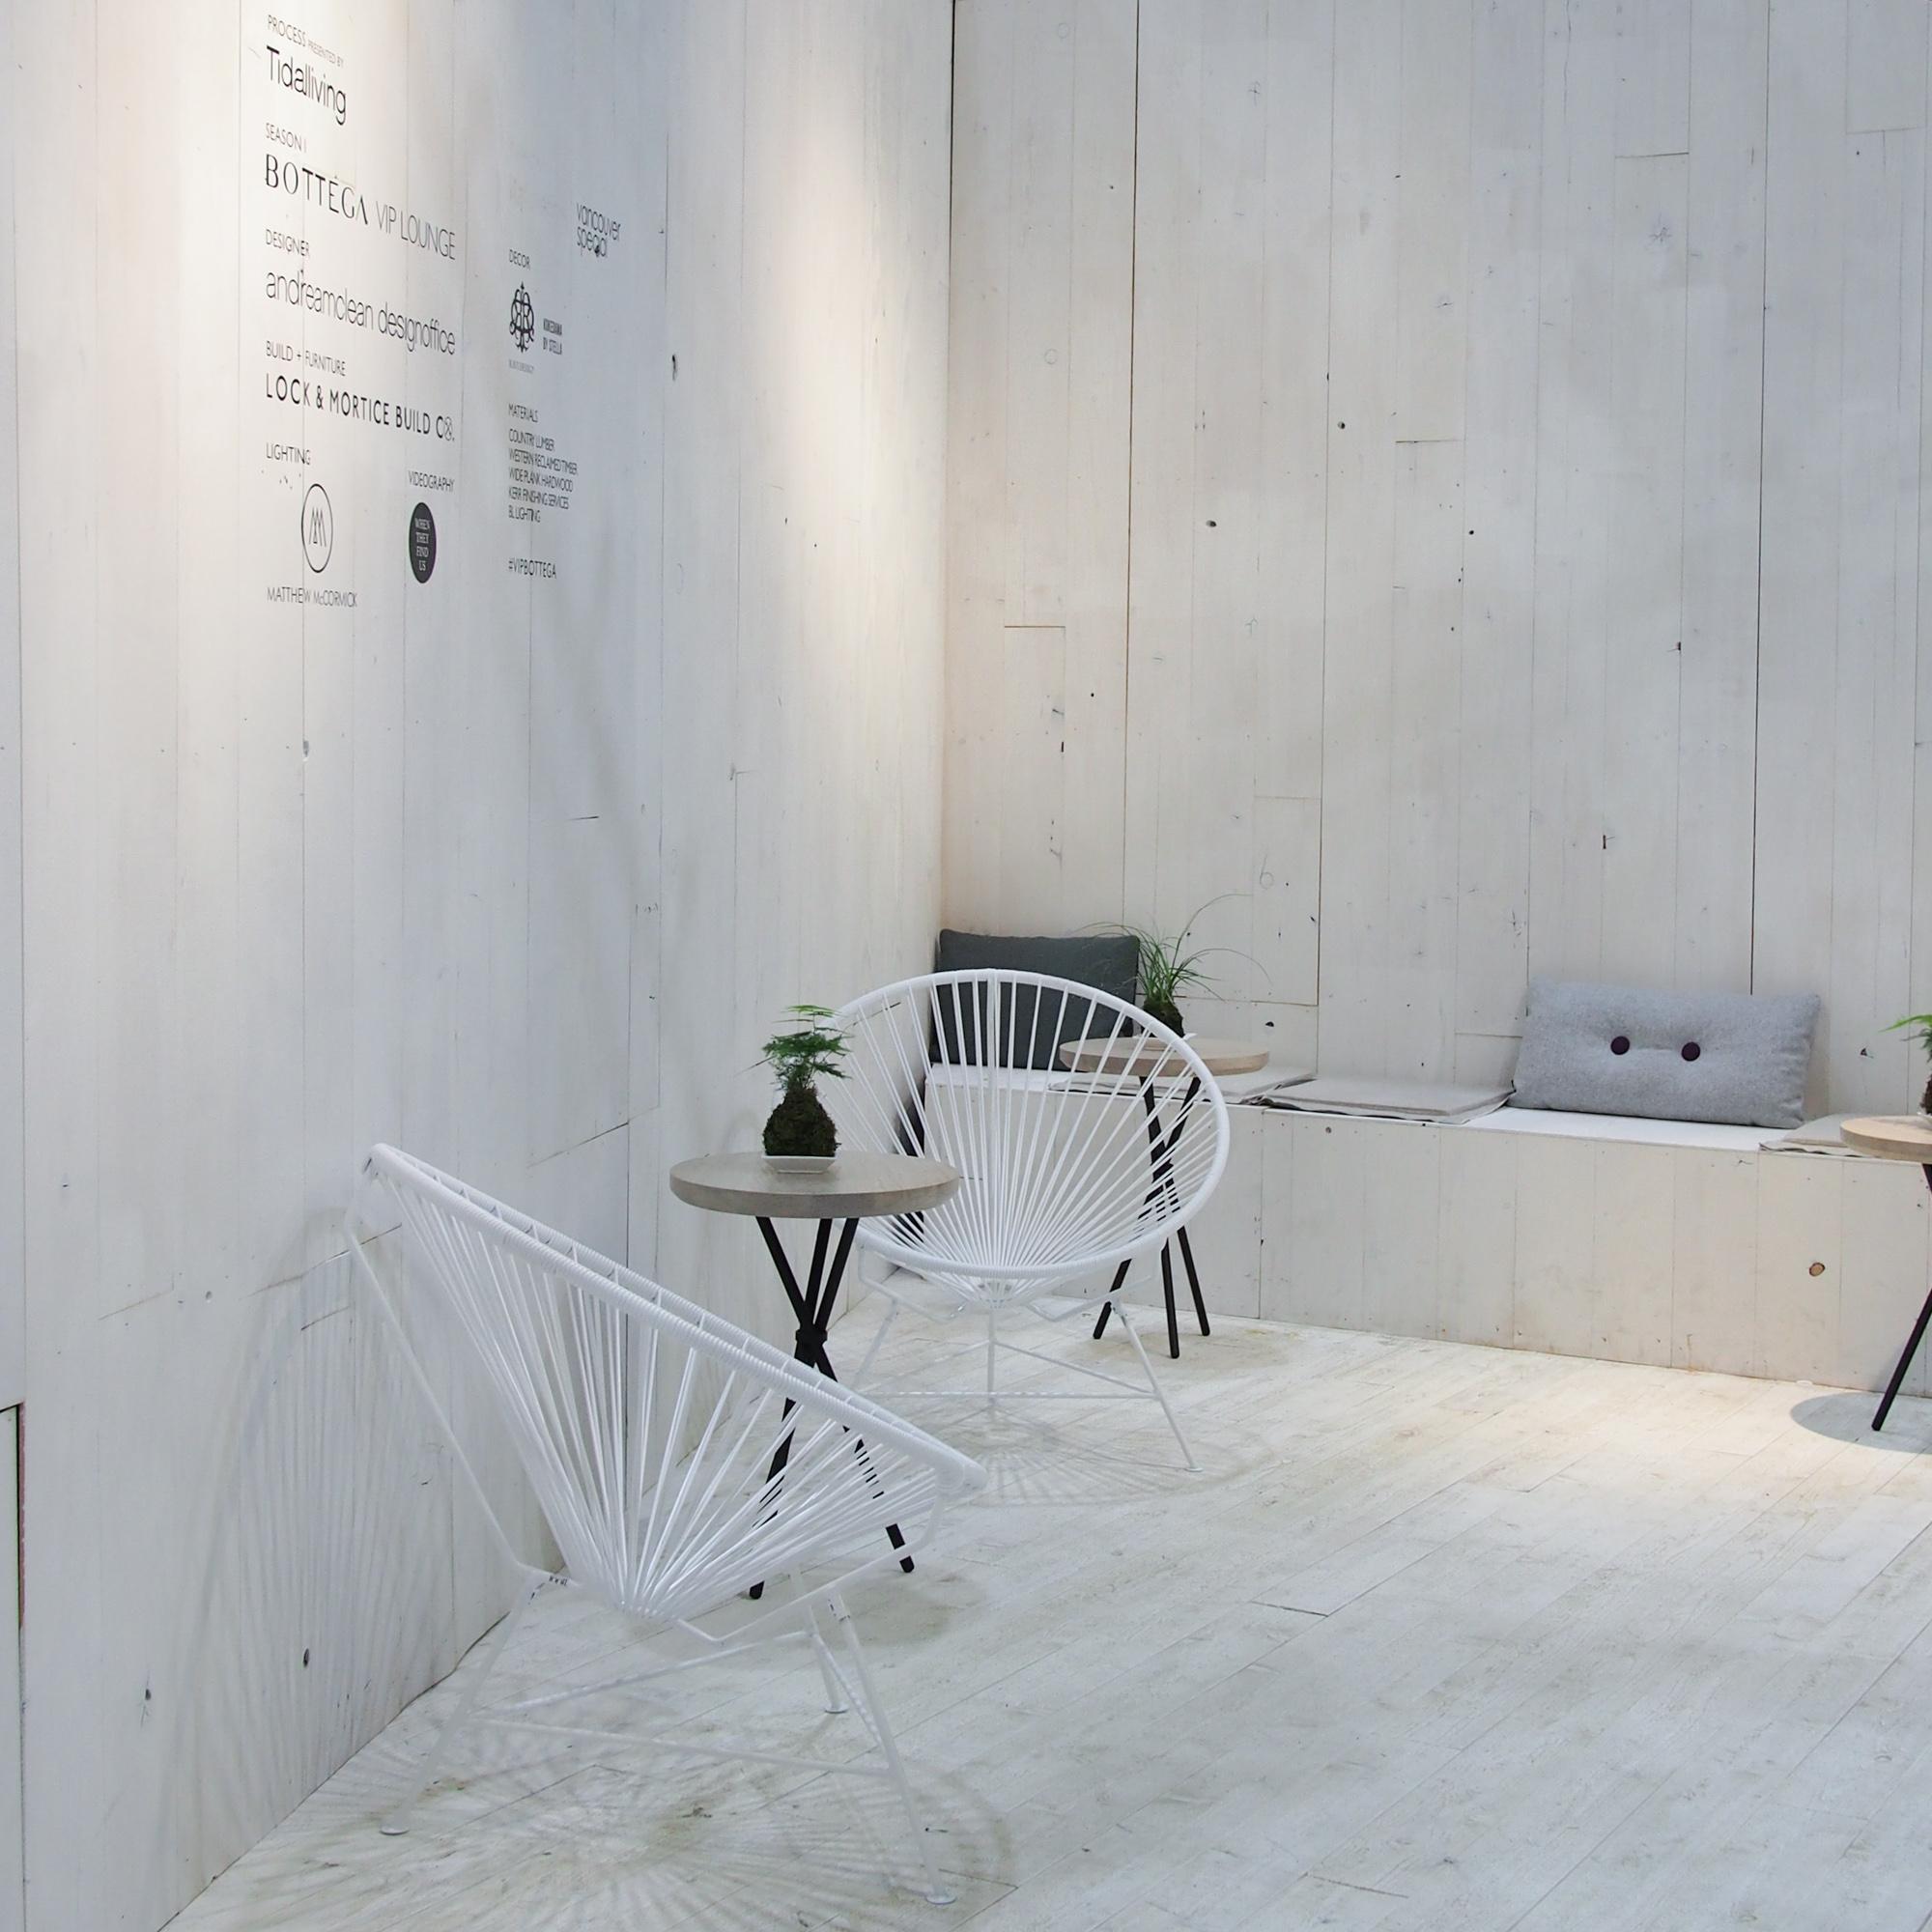 Bottega Vip Lounge-12.jpg